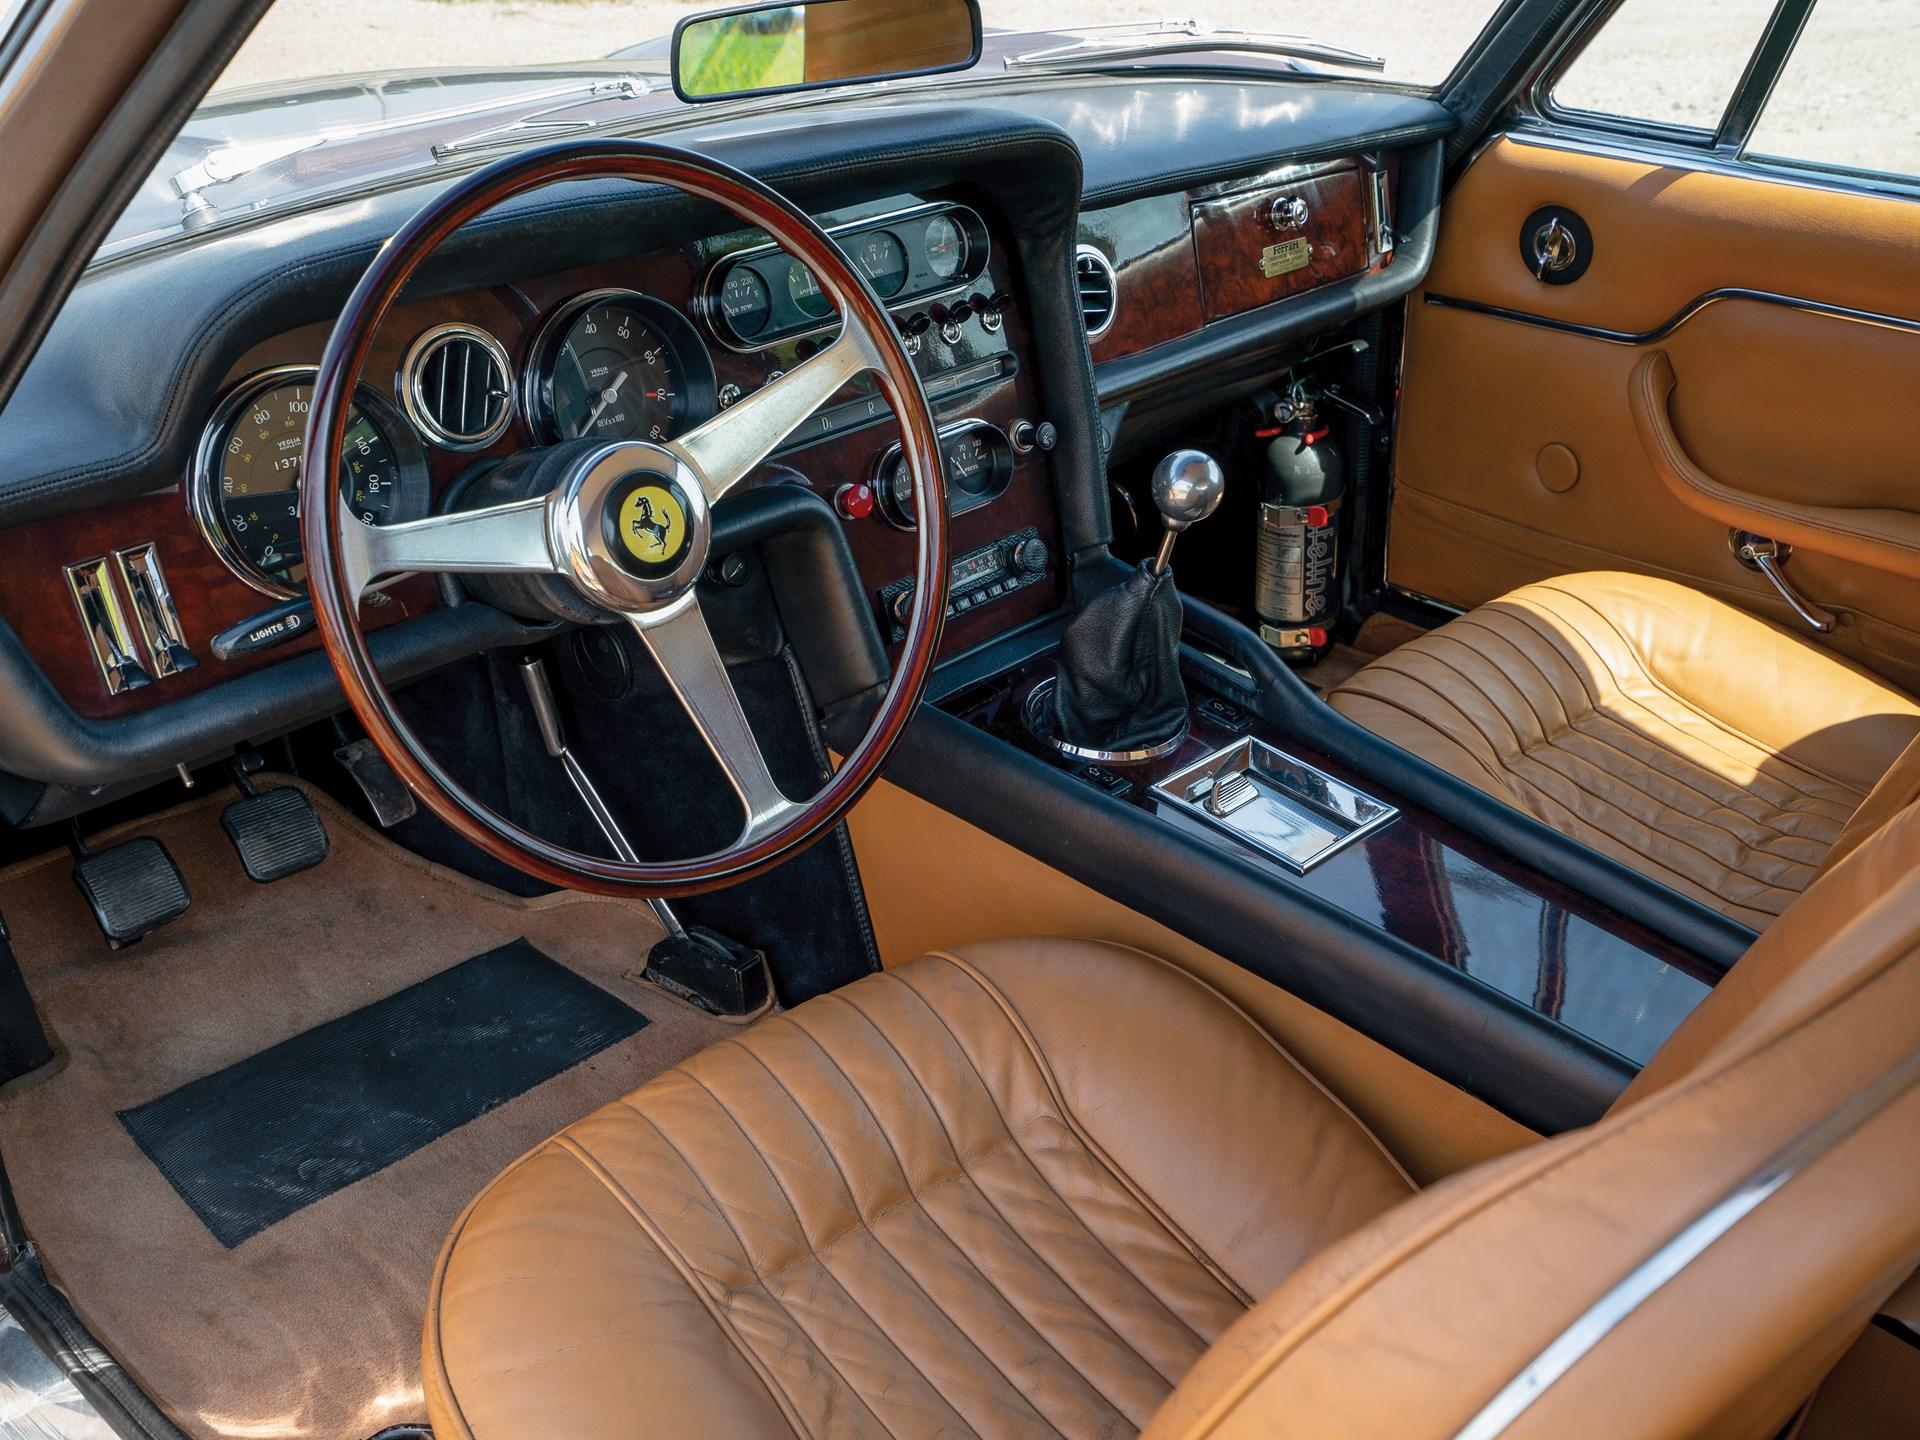 1965 Ferrari 330 GT 2+2 Shooting Brake interior drivers